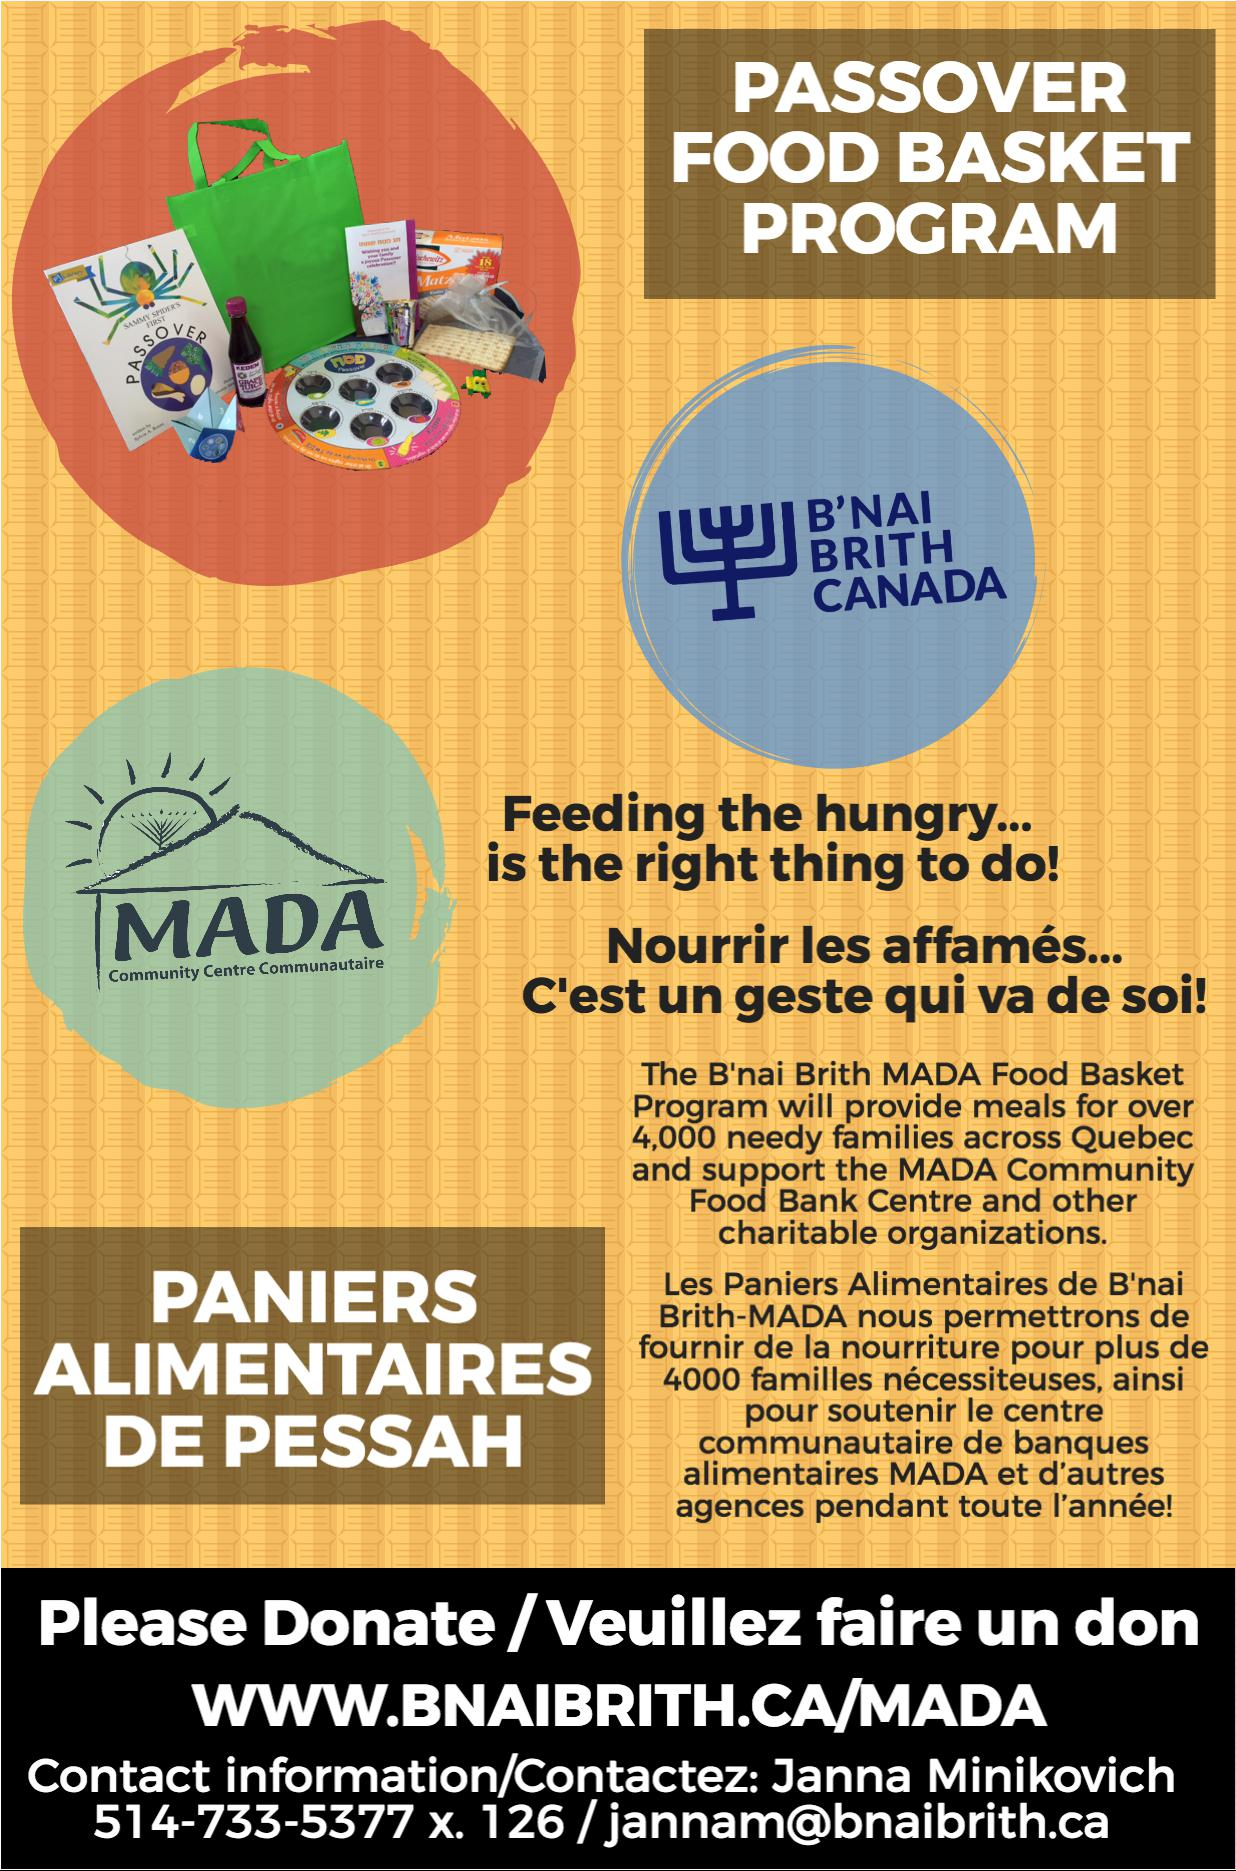 MADA_Passover_Food_Basket_Program_flyer.jpeg